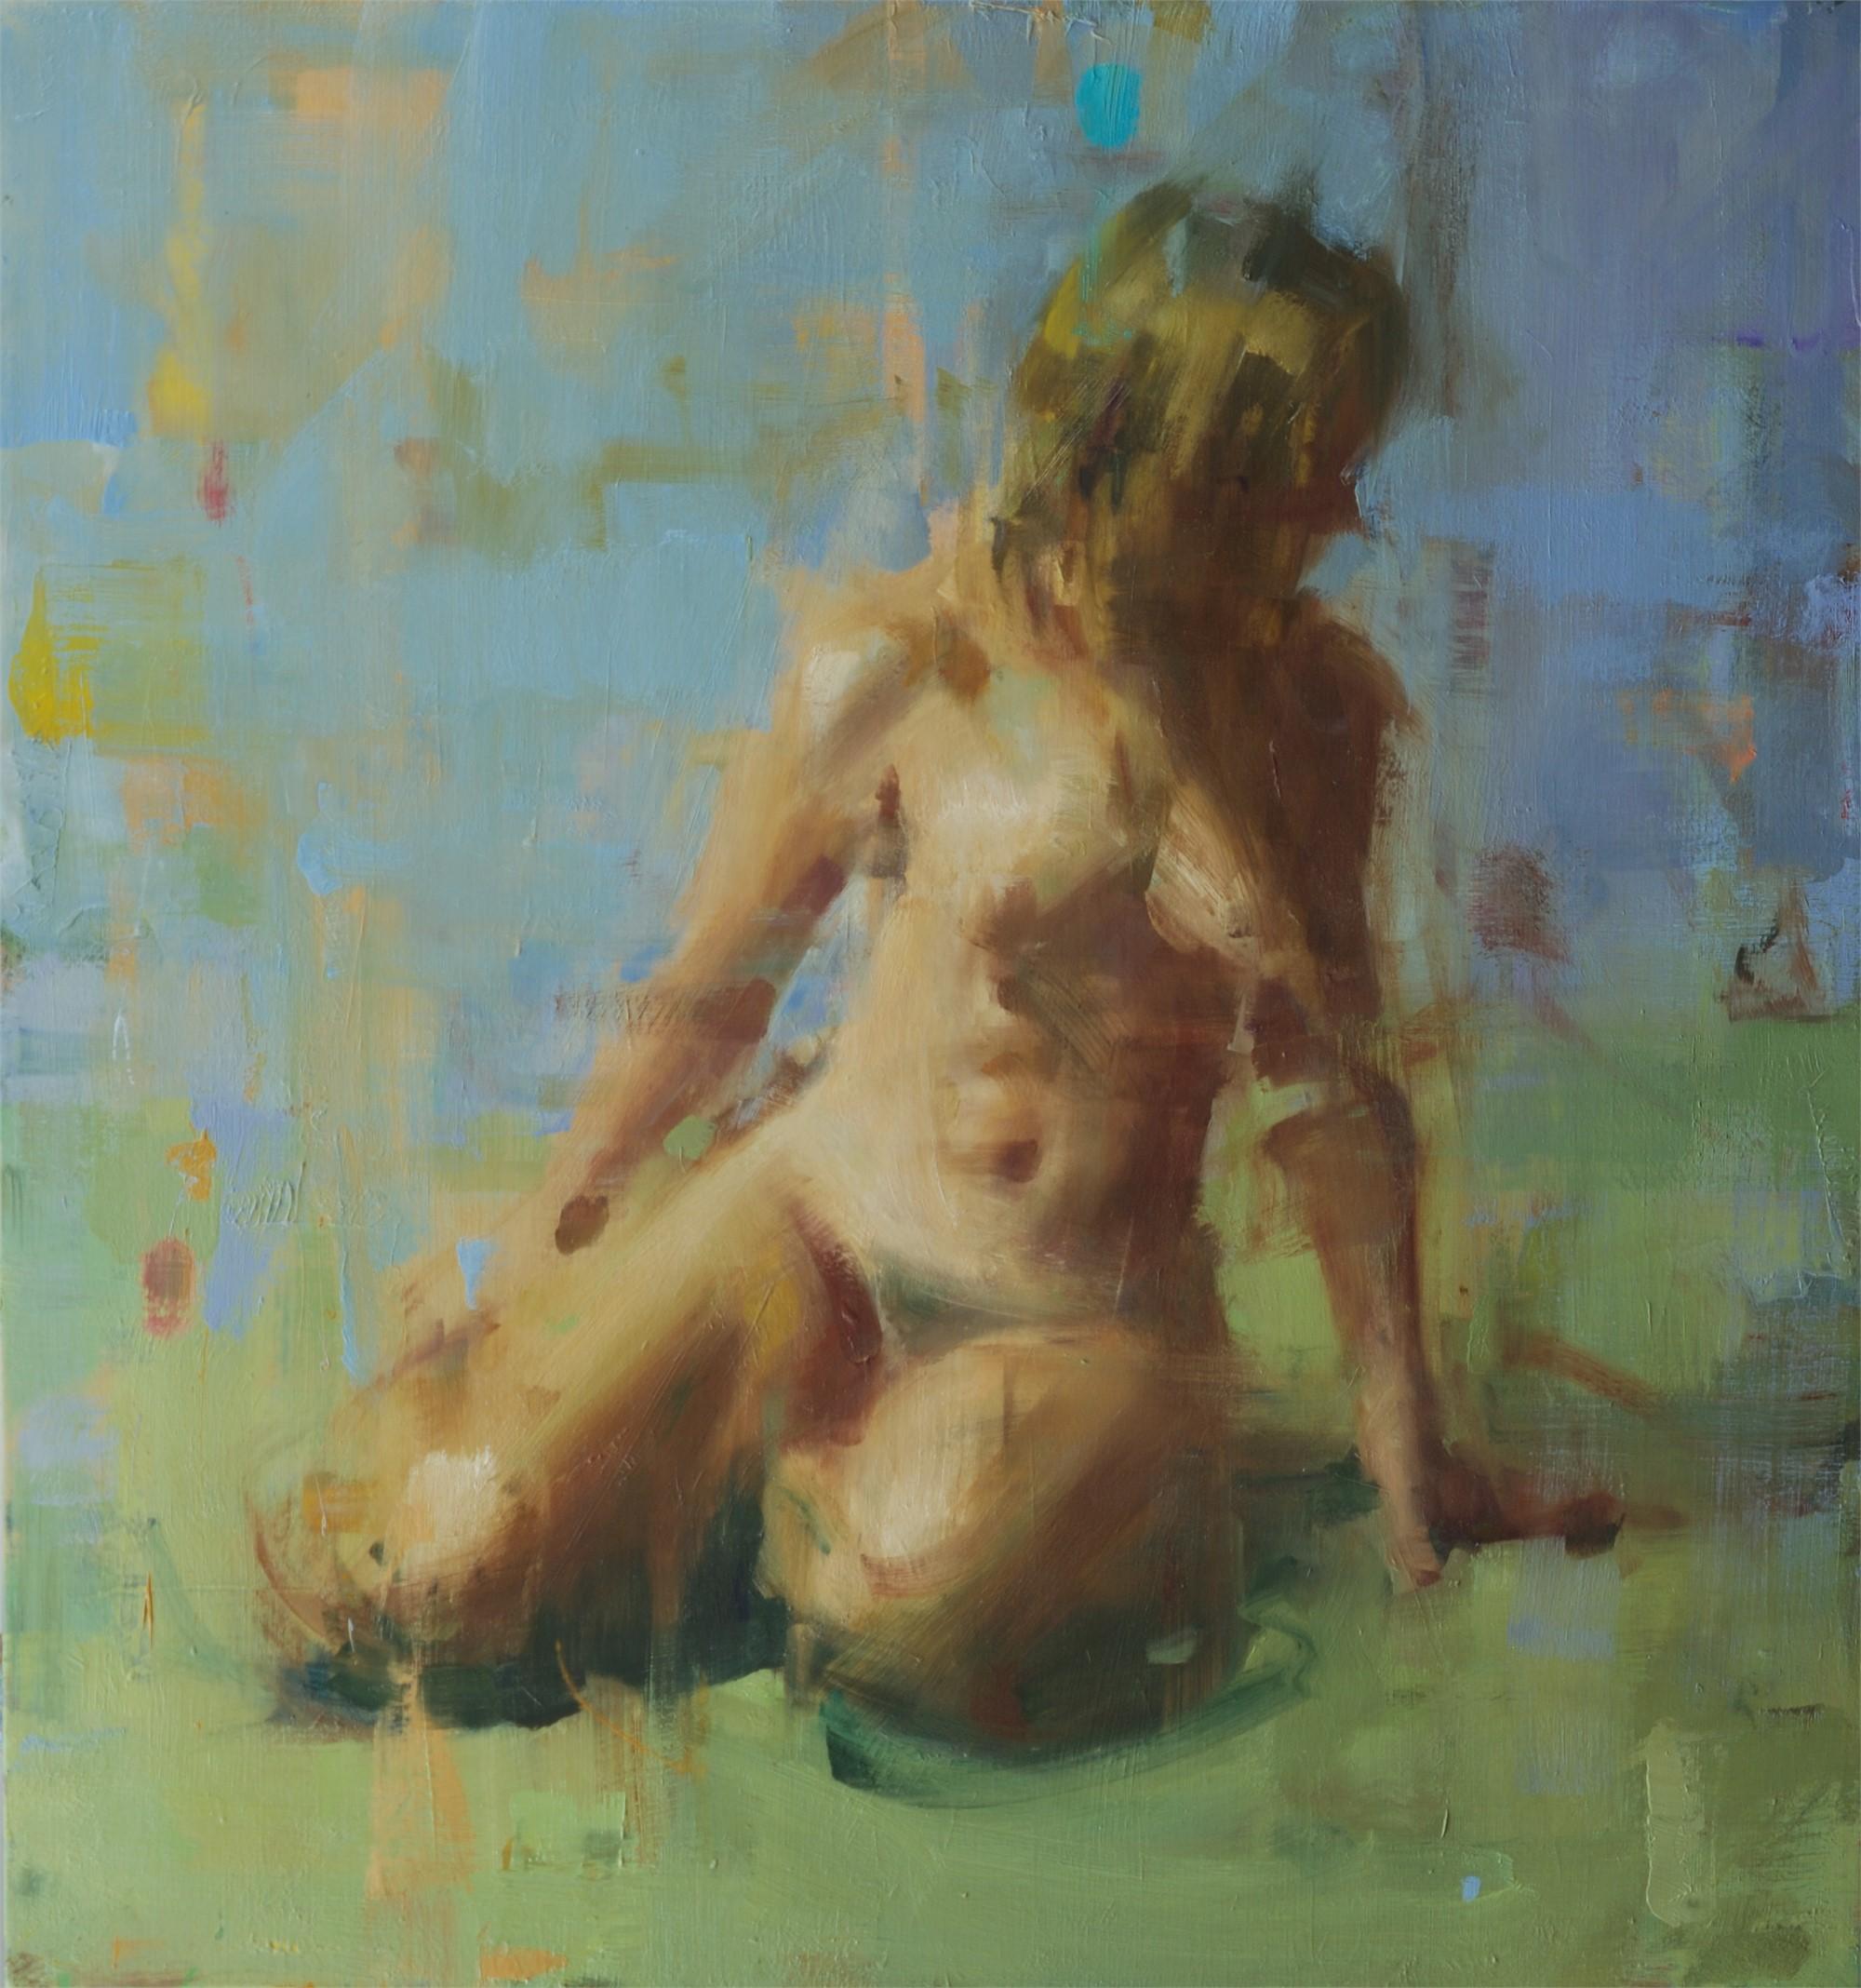 Nude on Green by David Shevlino